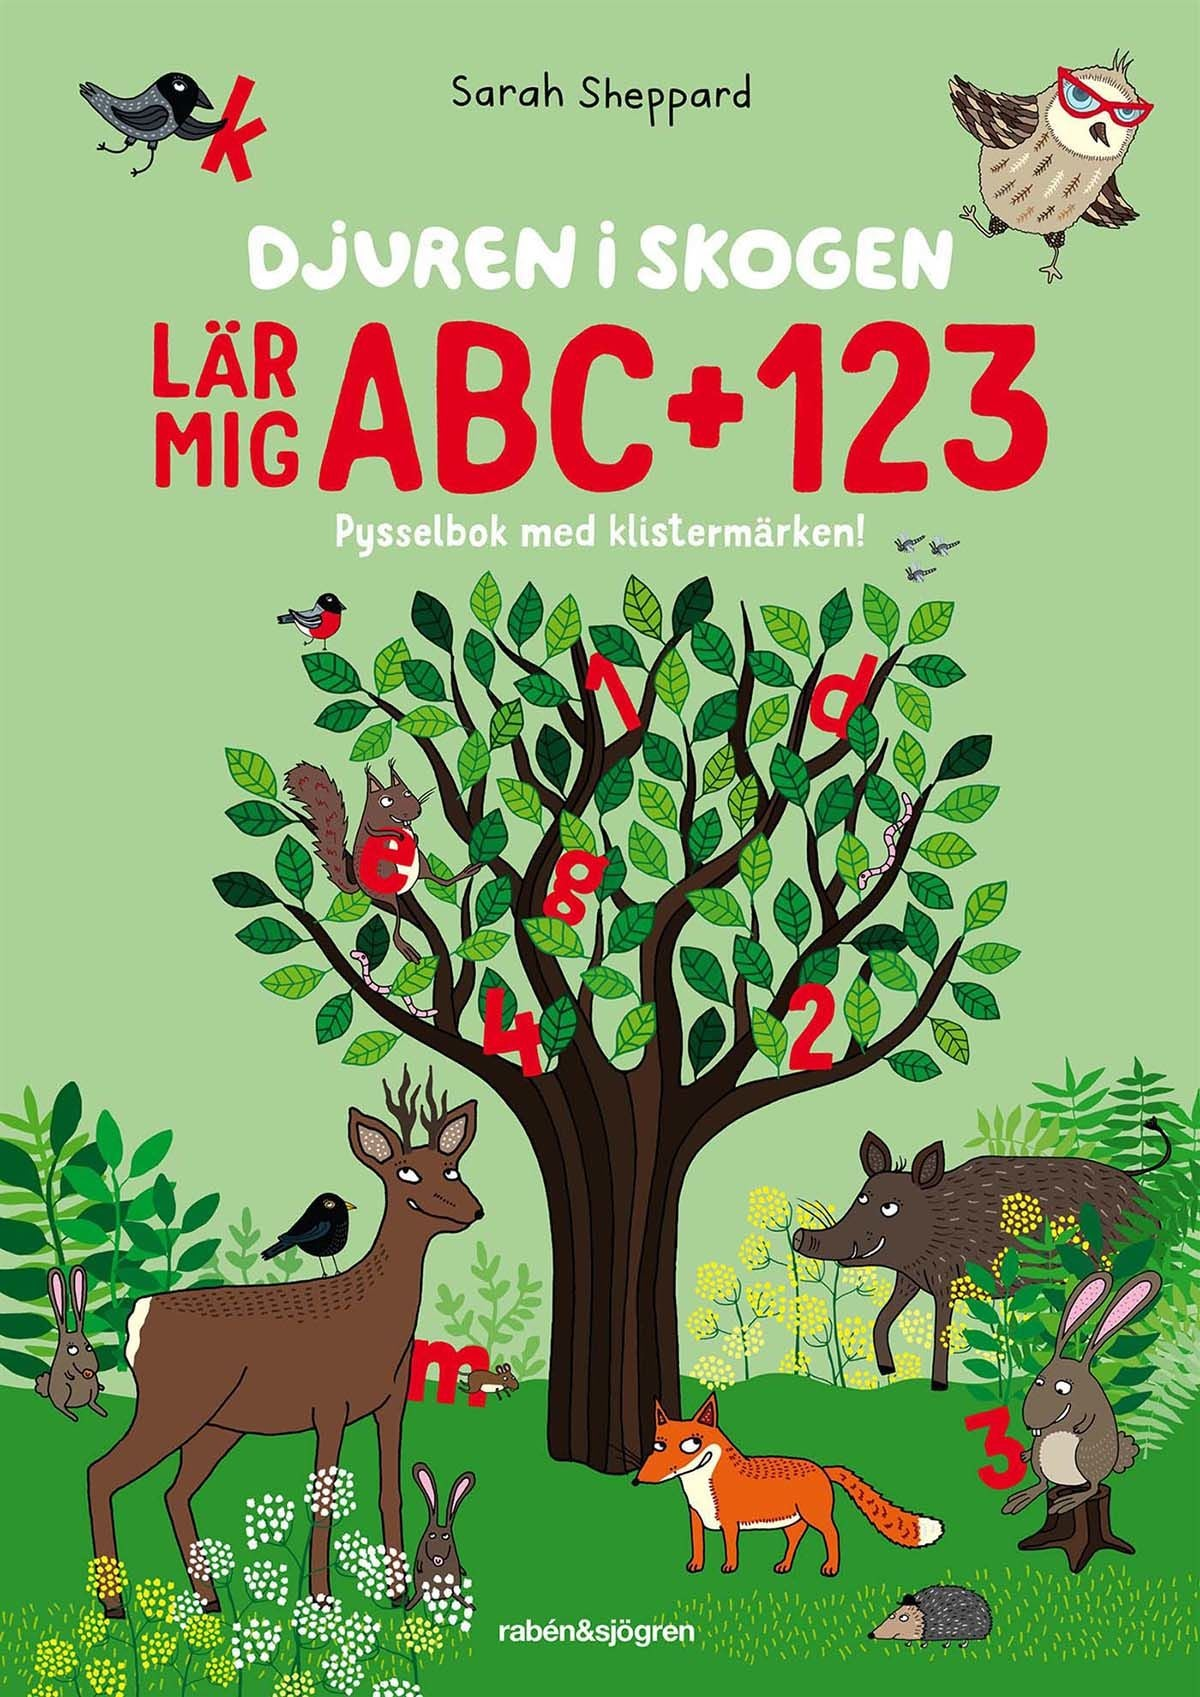 Rabén & Sjögren Djuren I Skogen Lär Mig ABC & 124